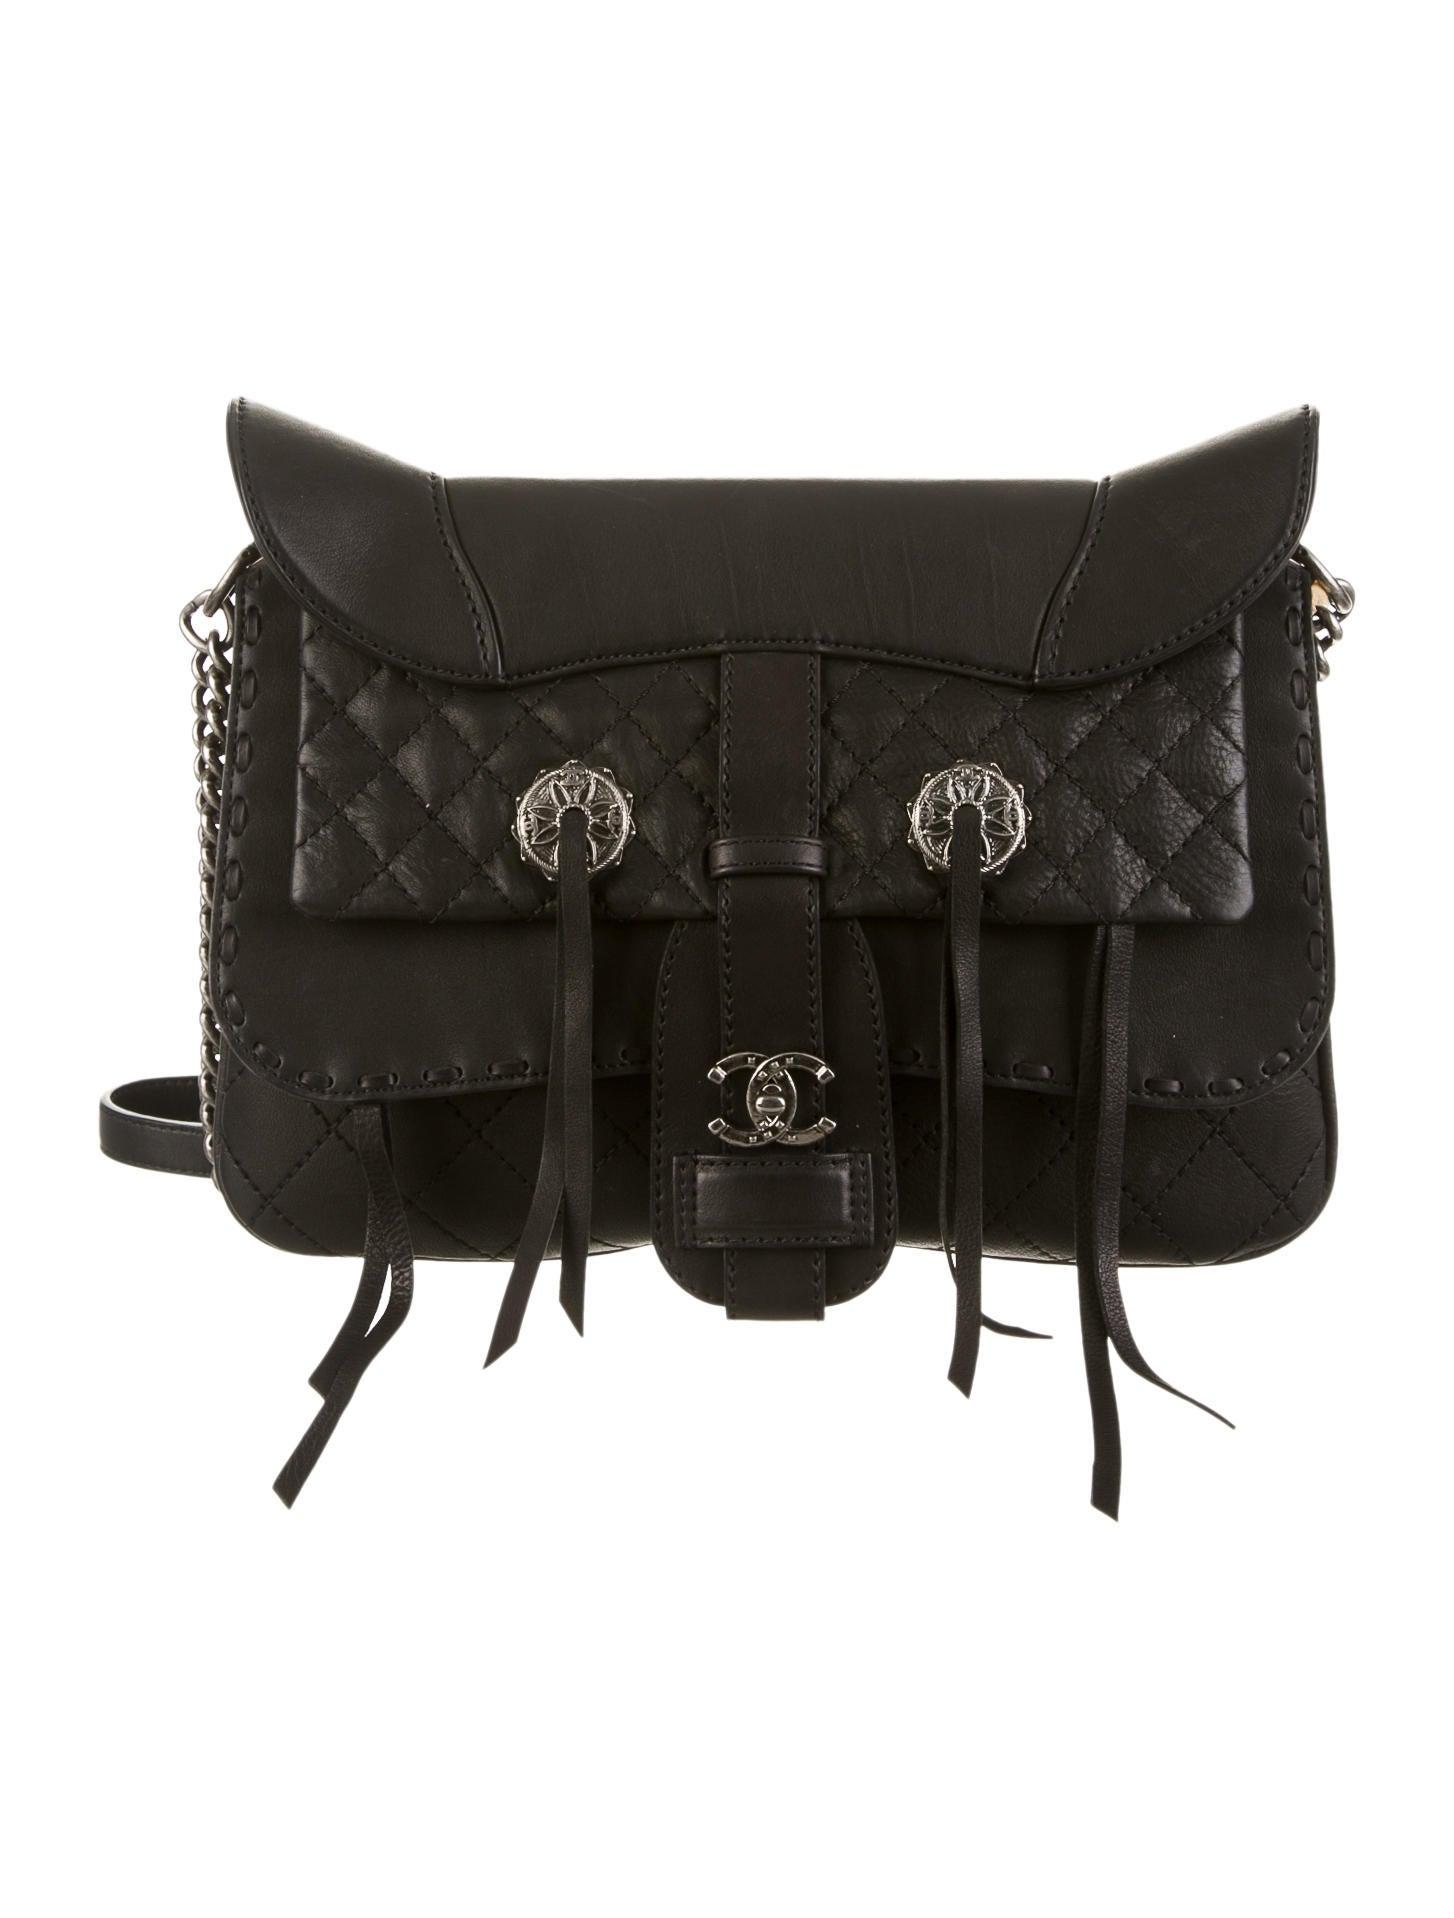 Paris Dallas Fringe Saddle Bag